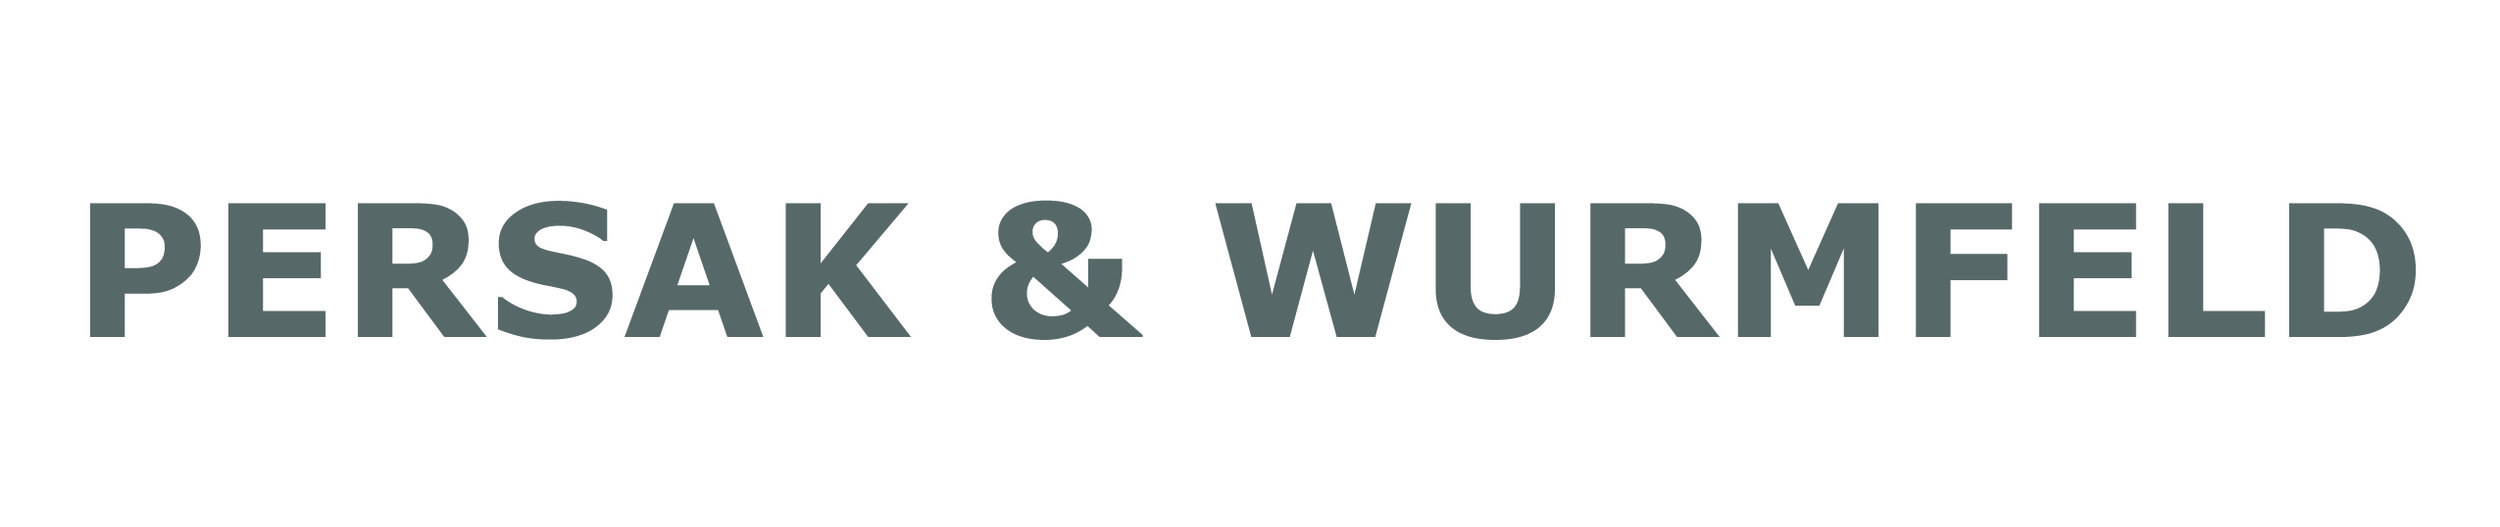 PersakWurmfeld_logo.jpg